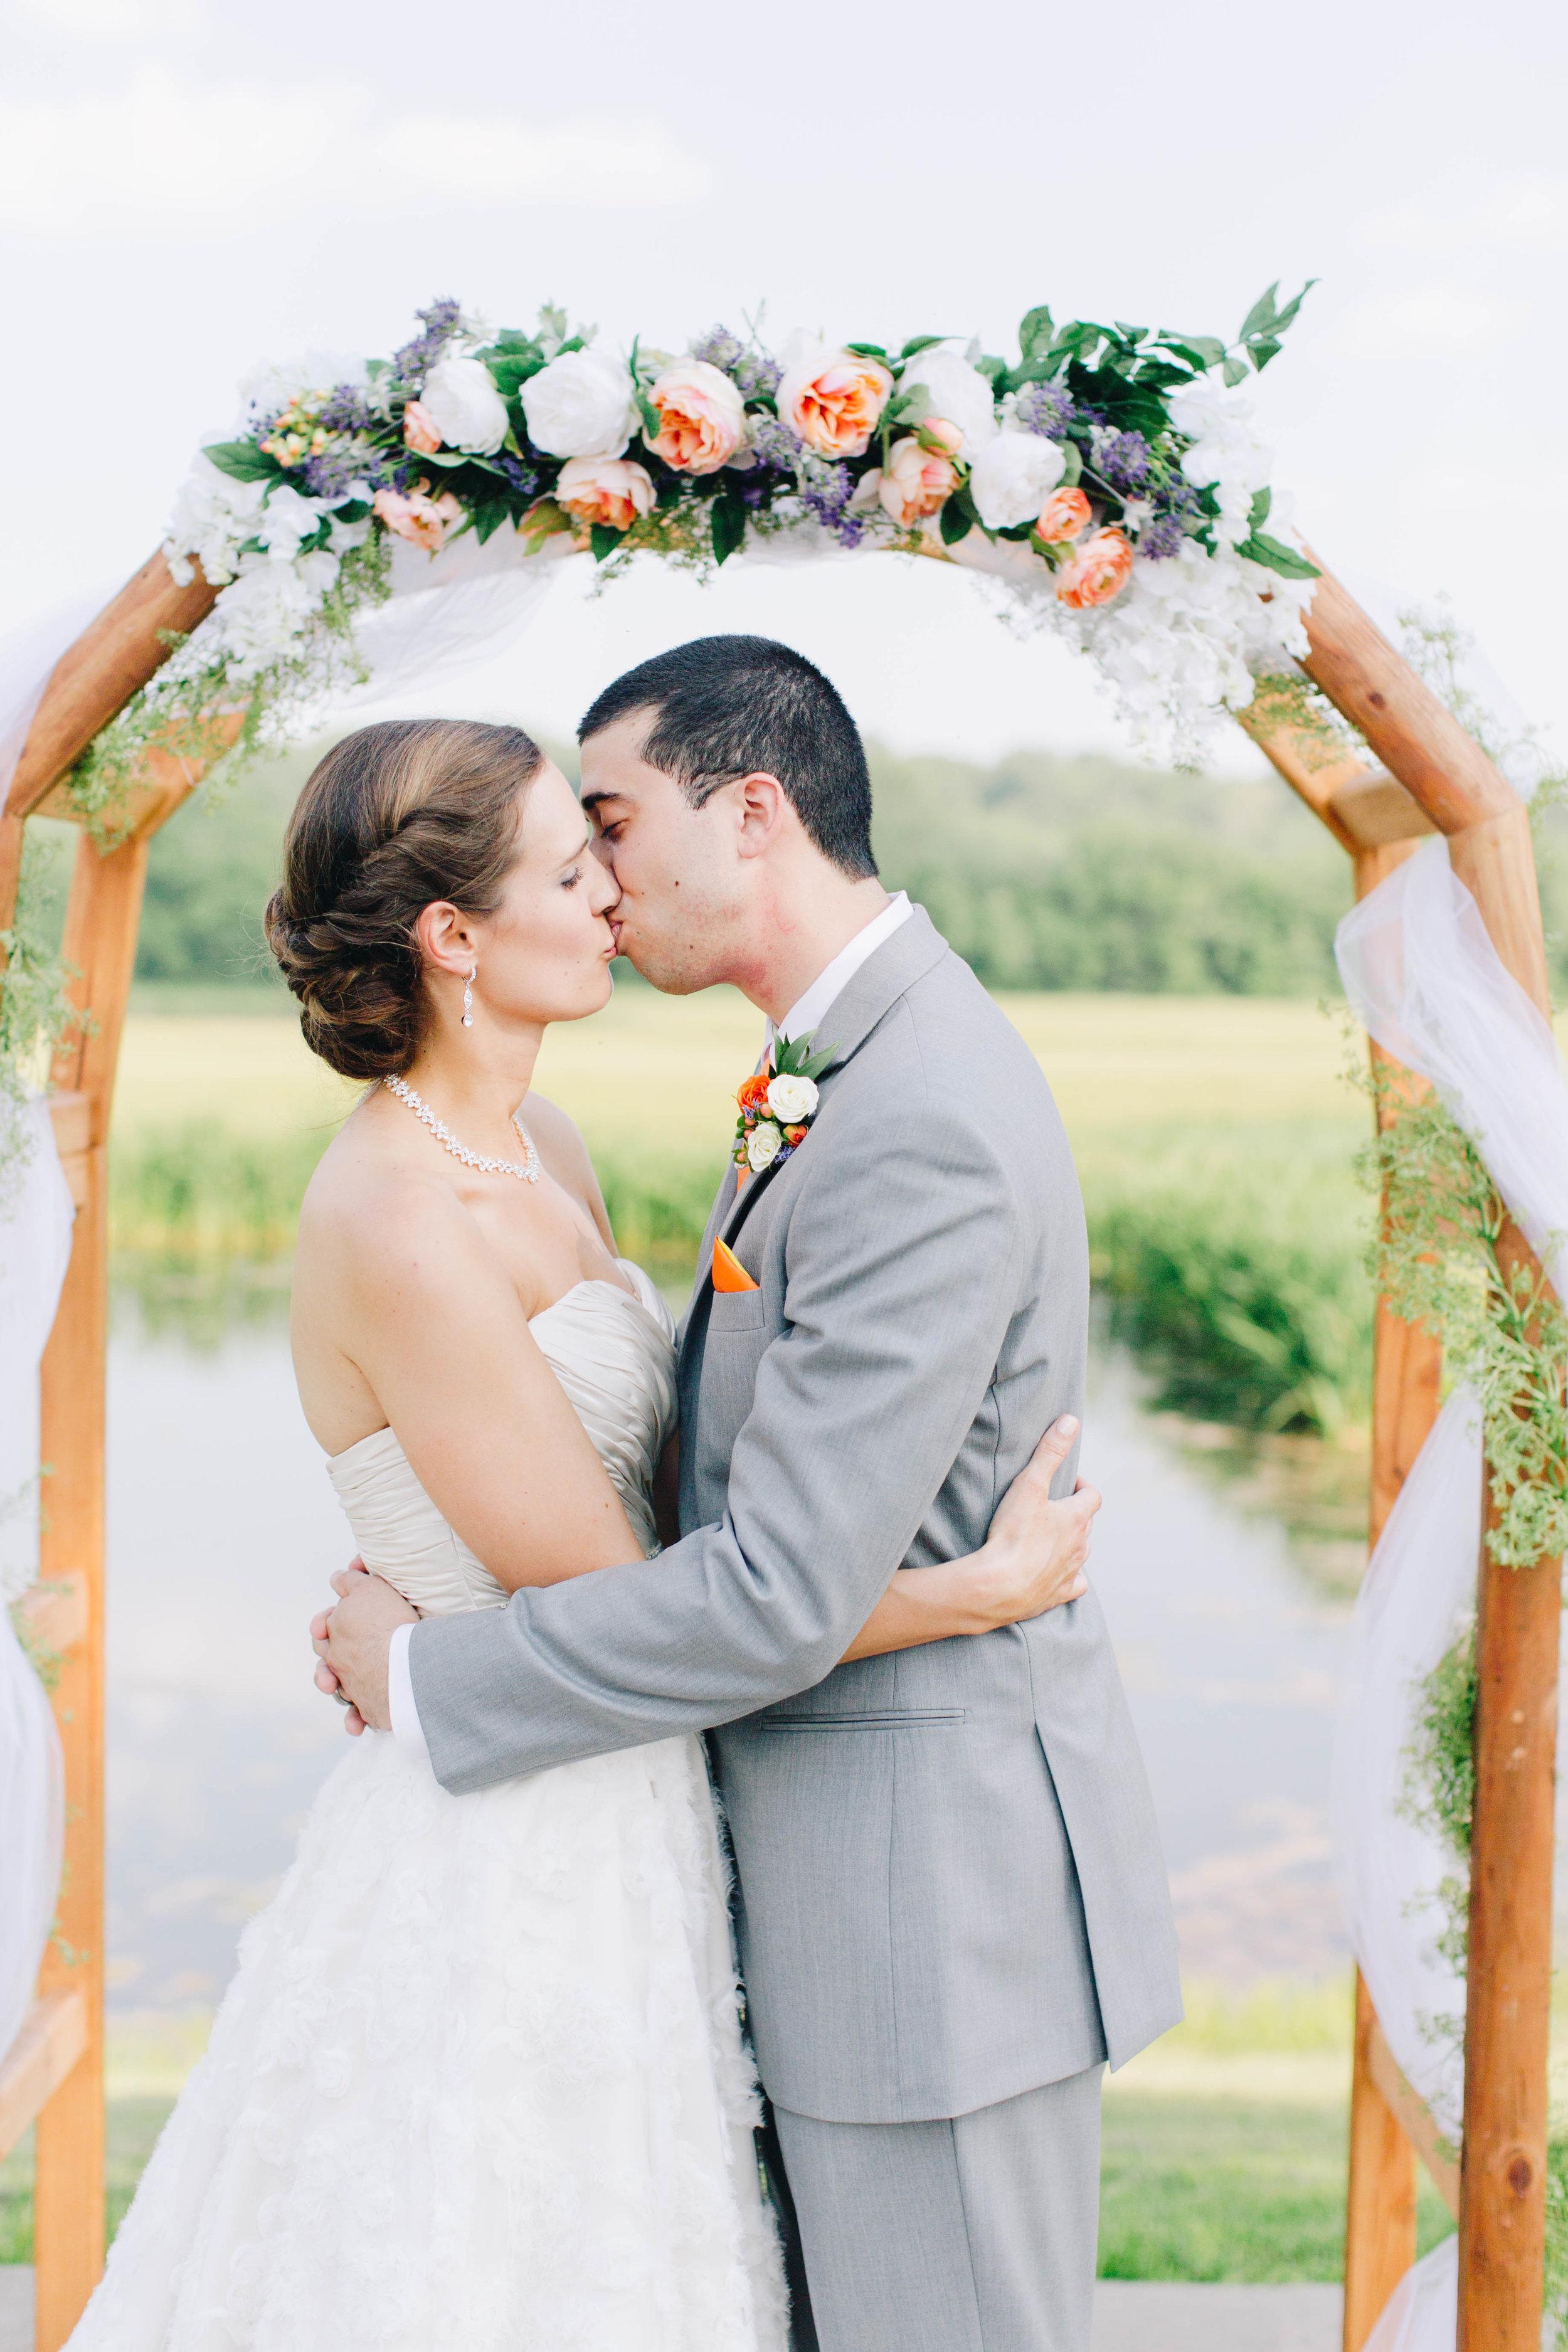 weddinghighlights-20.jpg